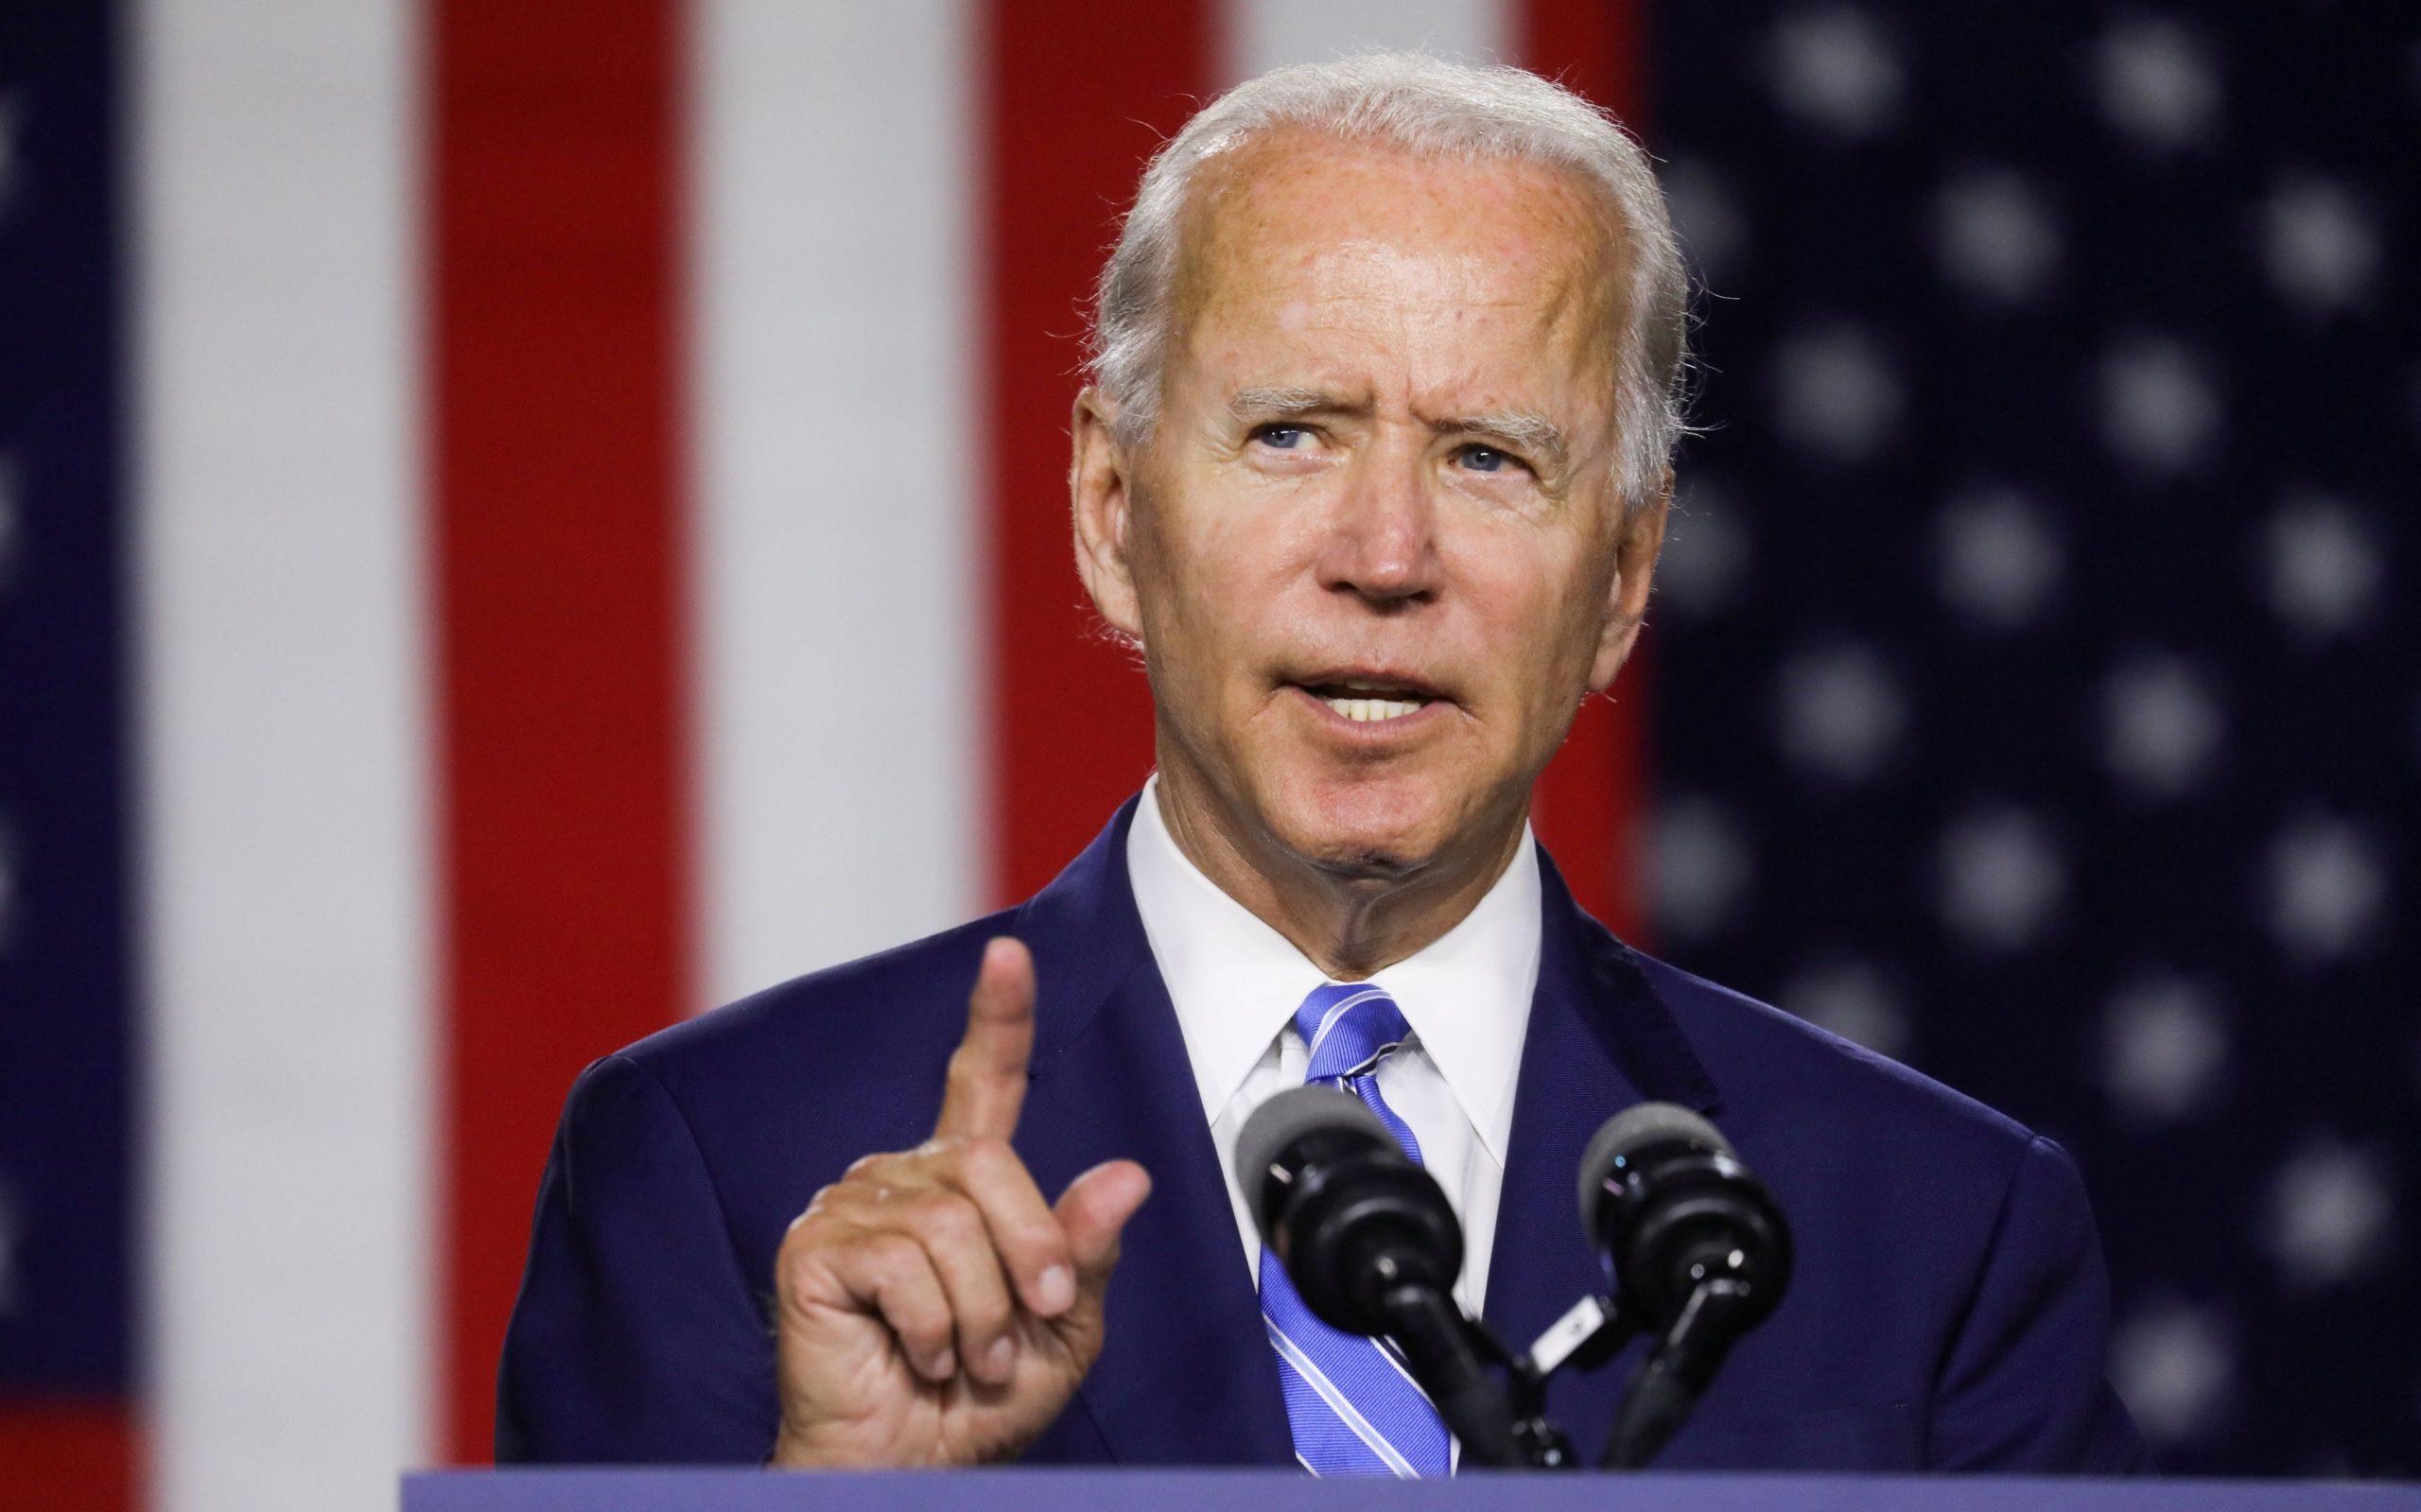 Democratic U.S. presidential candidate Biden